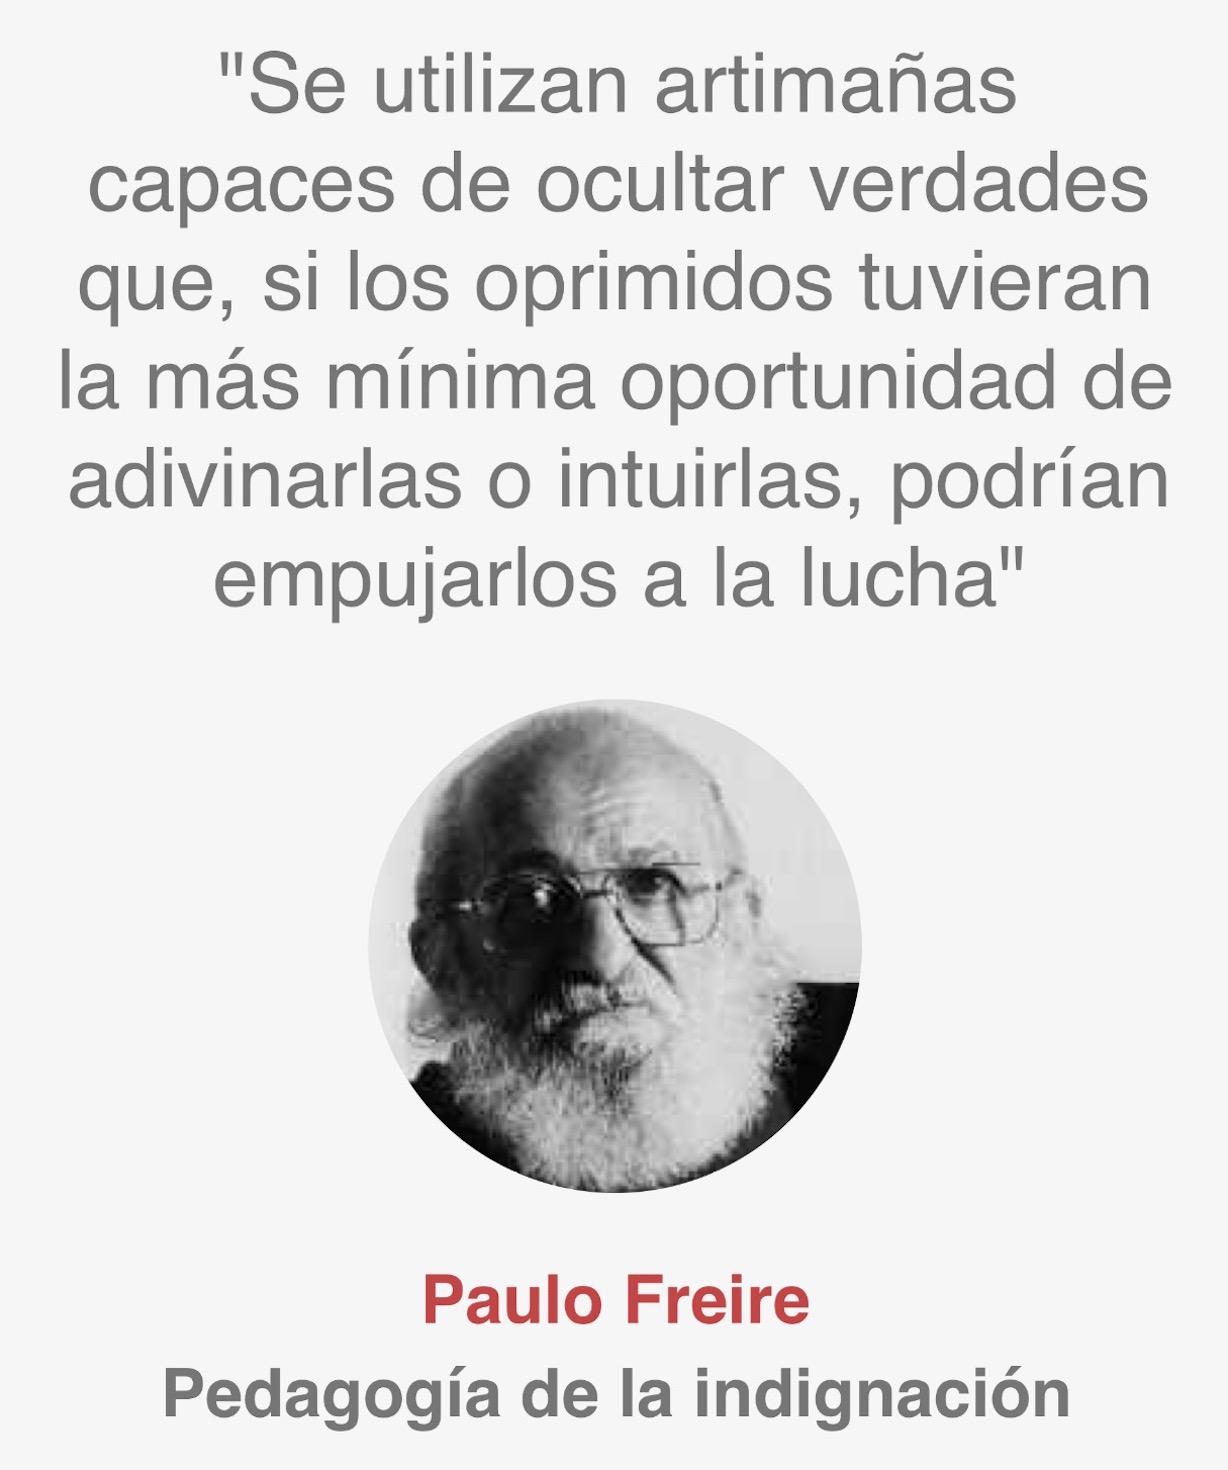 Cita Freire